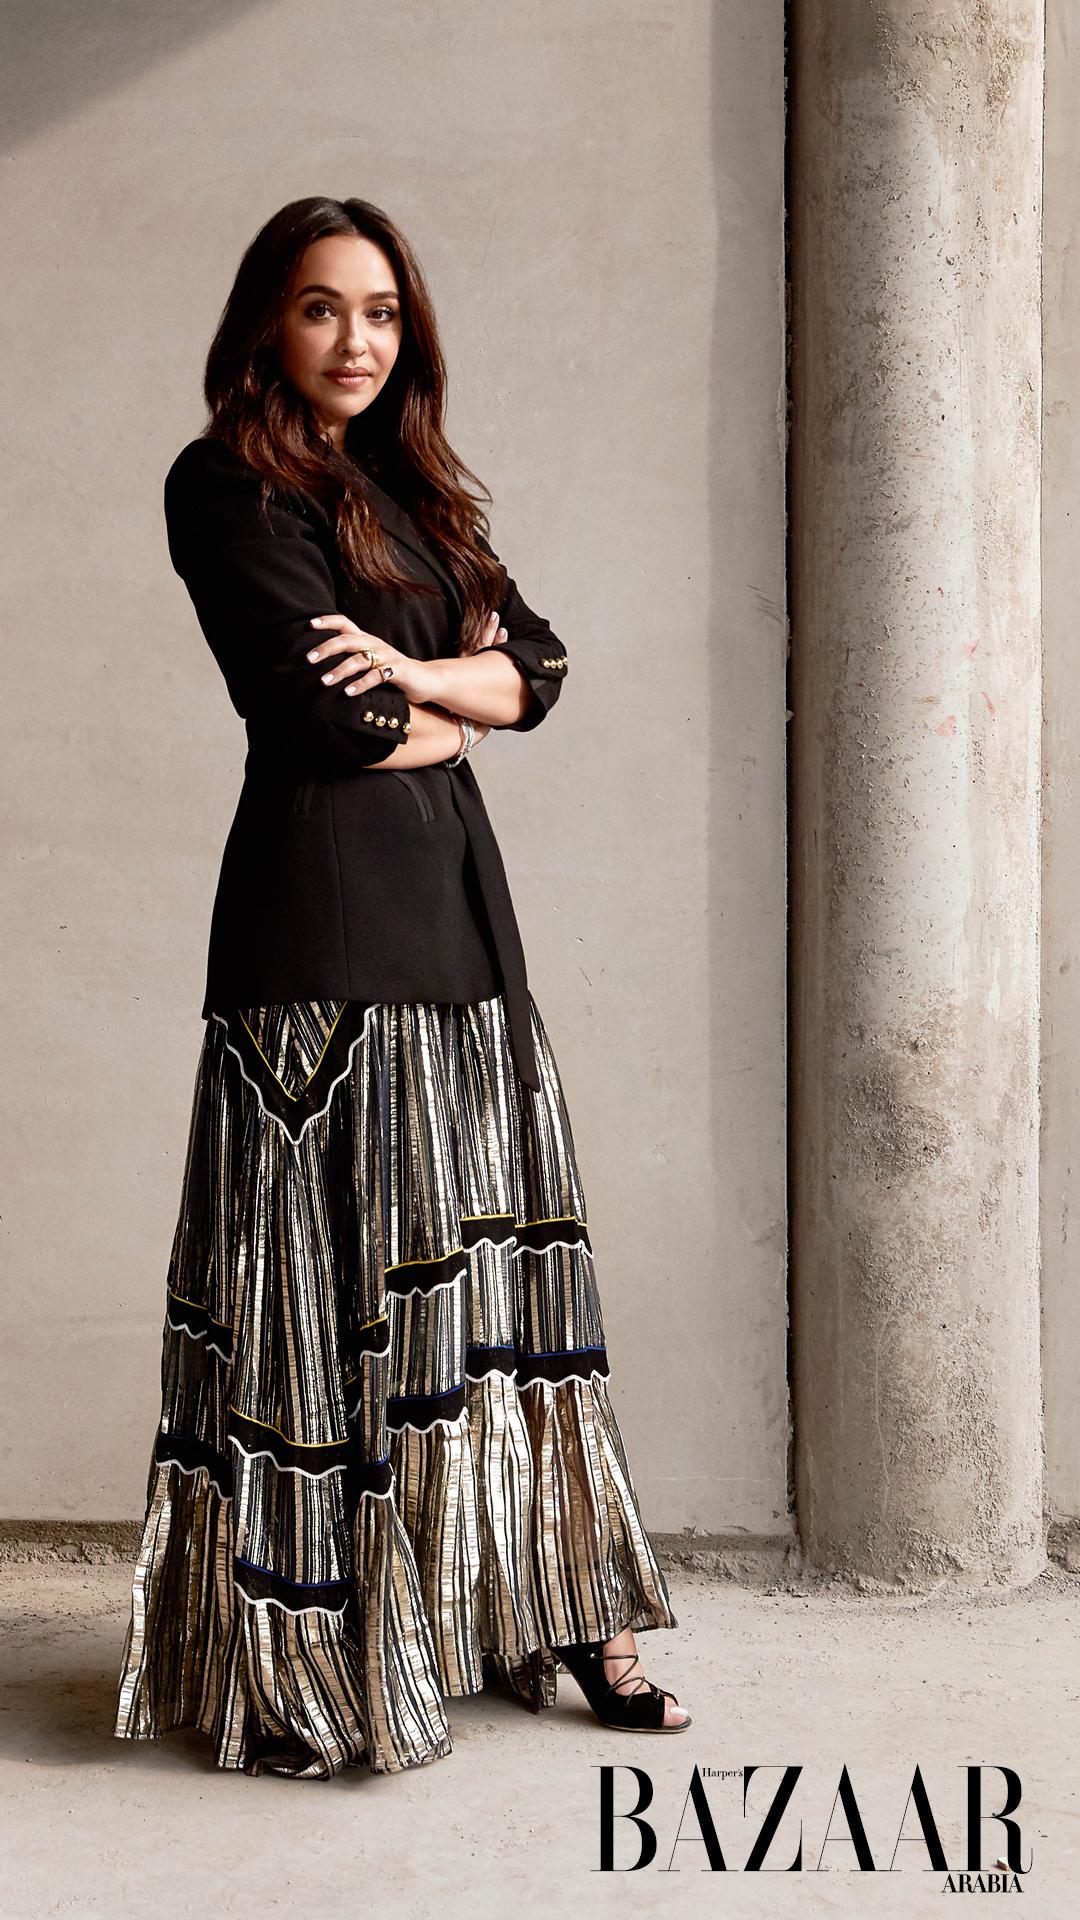 Elegant fully clothed women